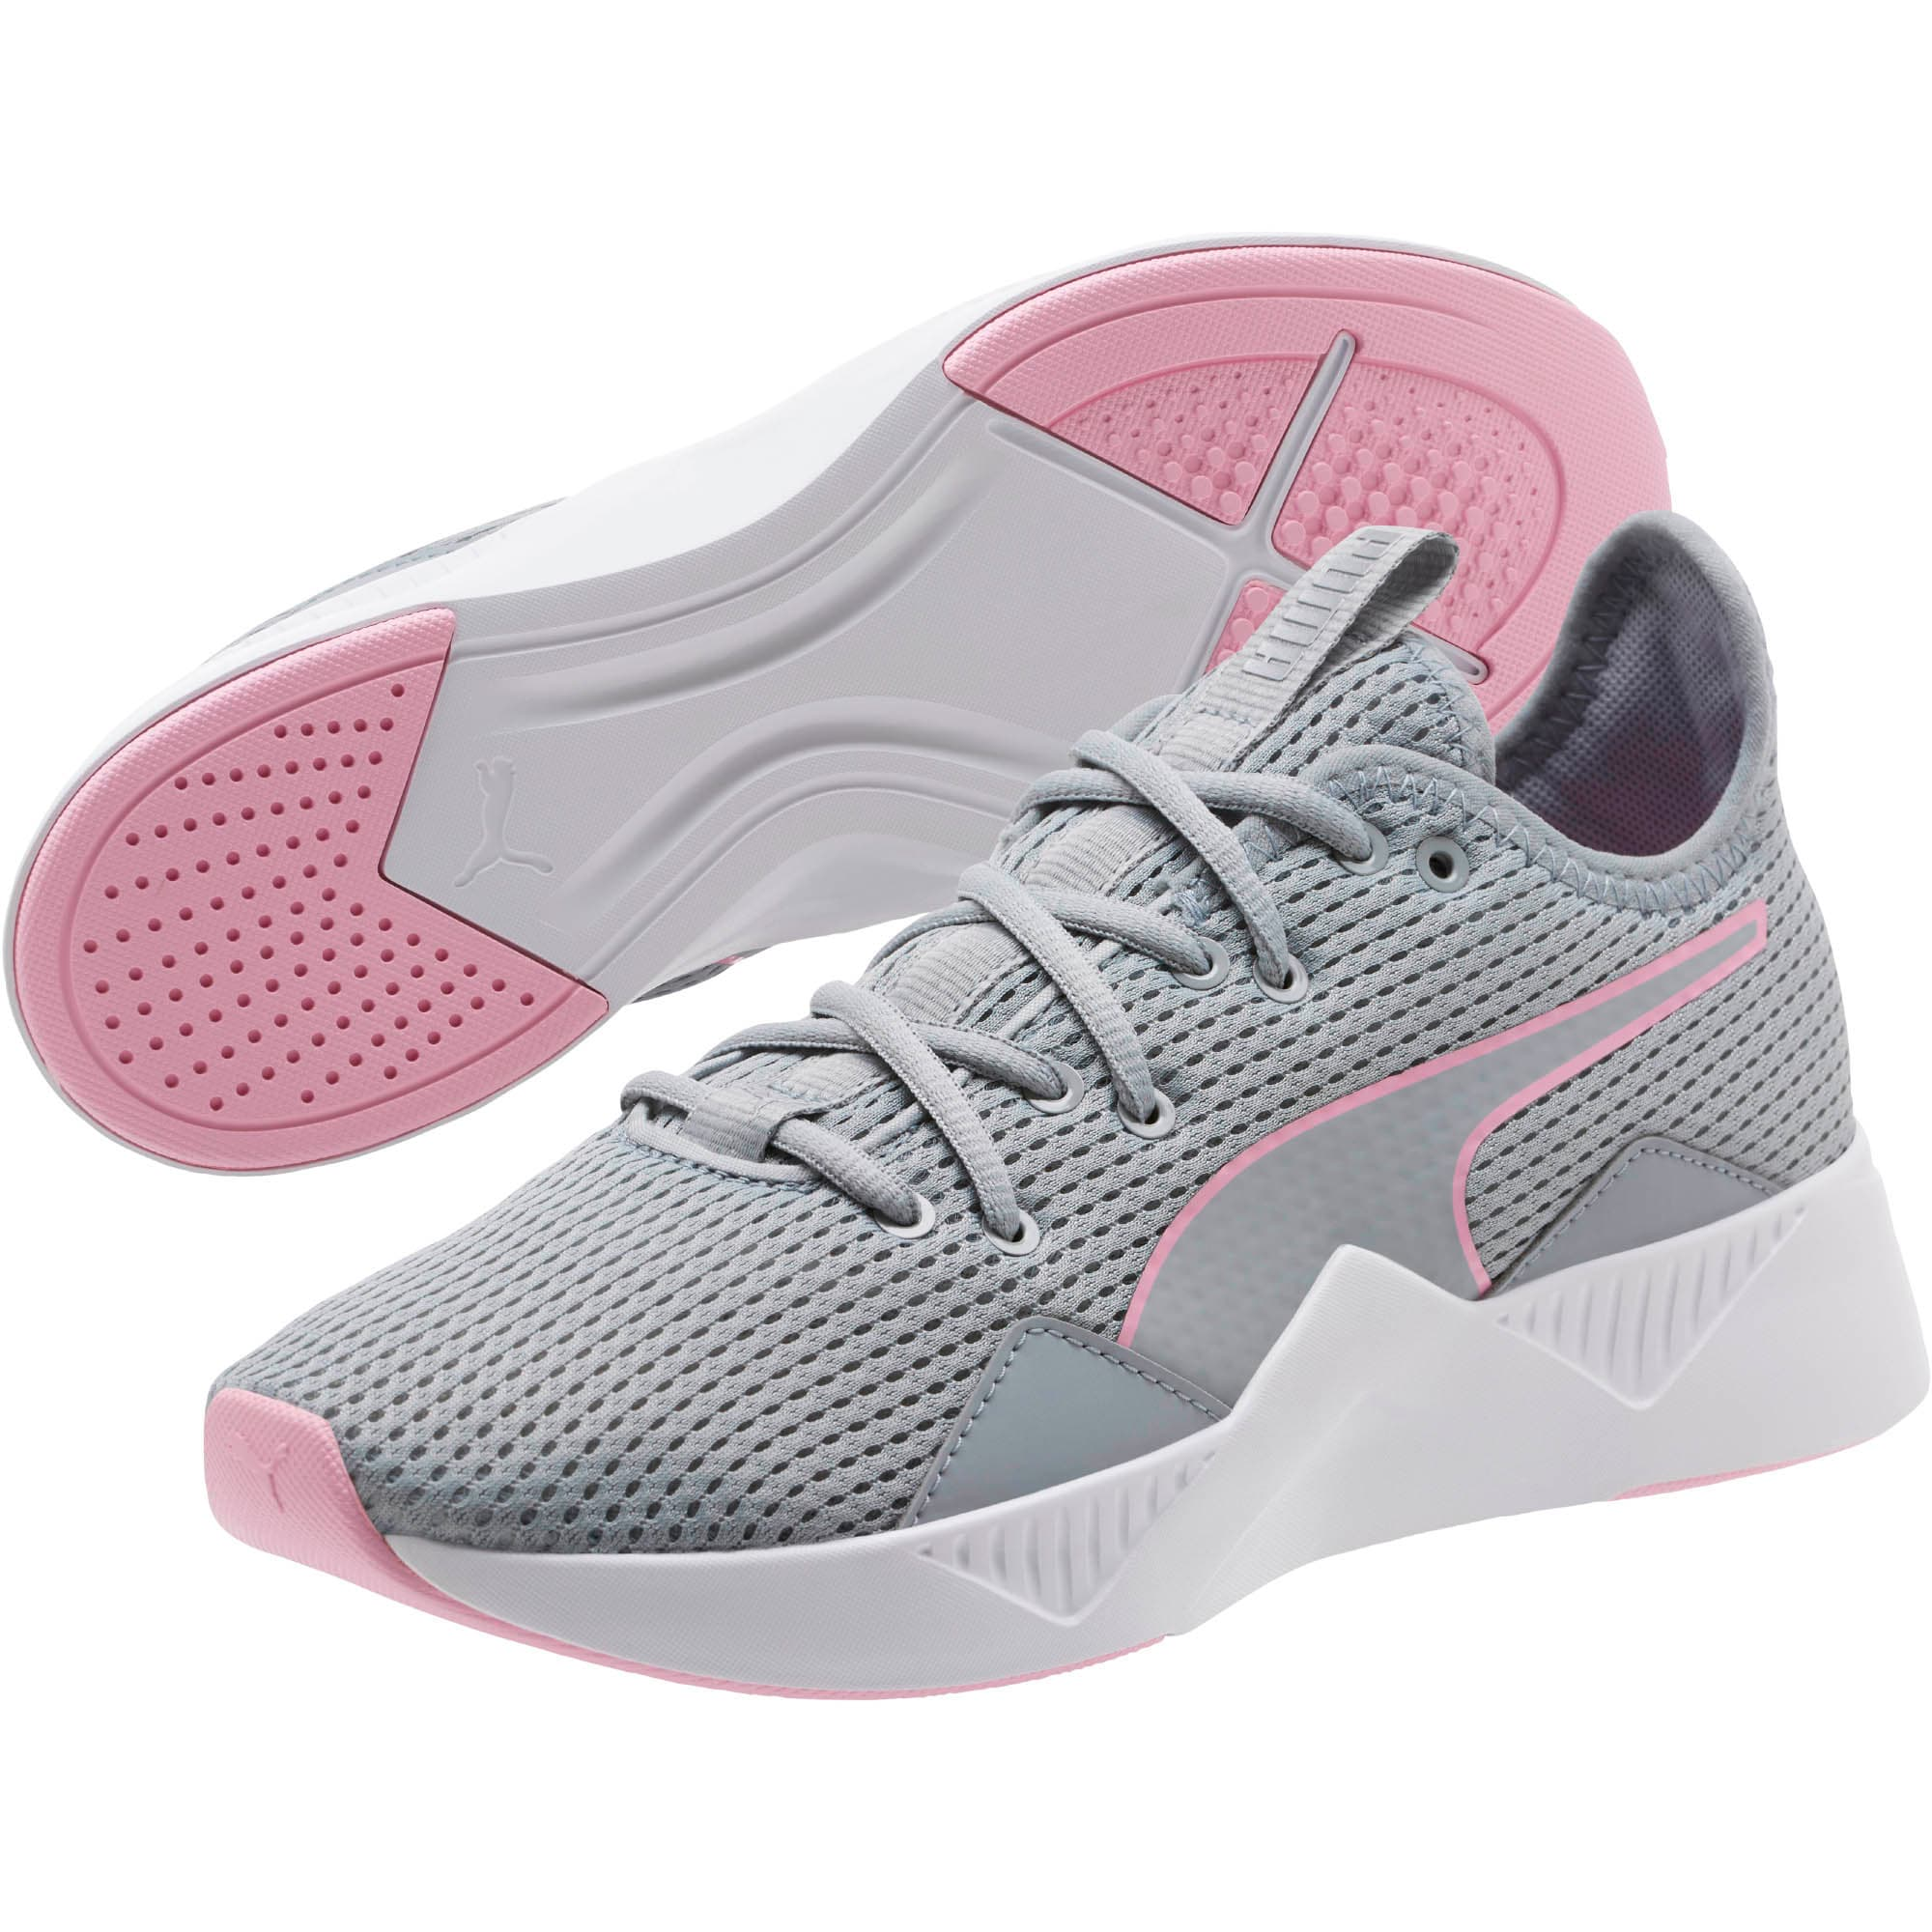 Thumbnail 2 of Incite FS Cosmic Women's Training Shoes, Quarry-Pale Pink, medium